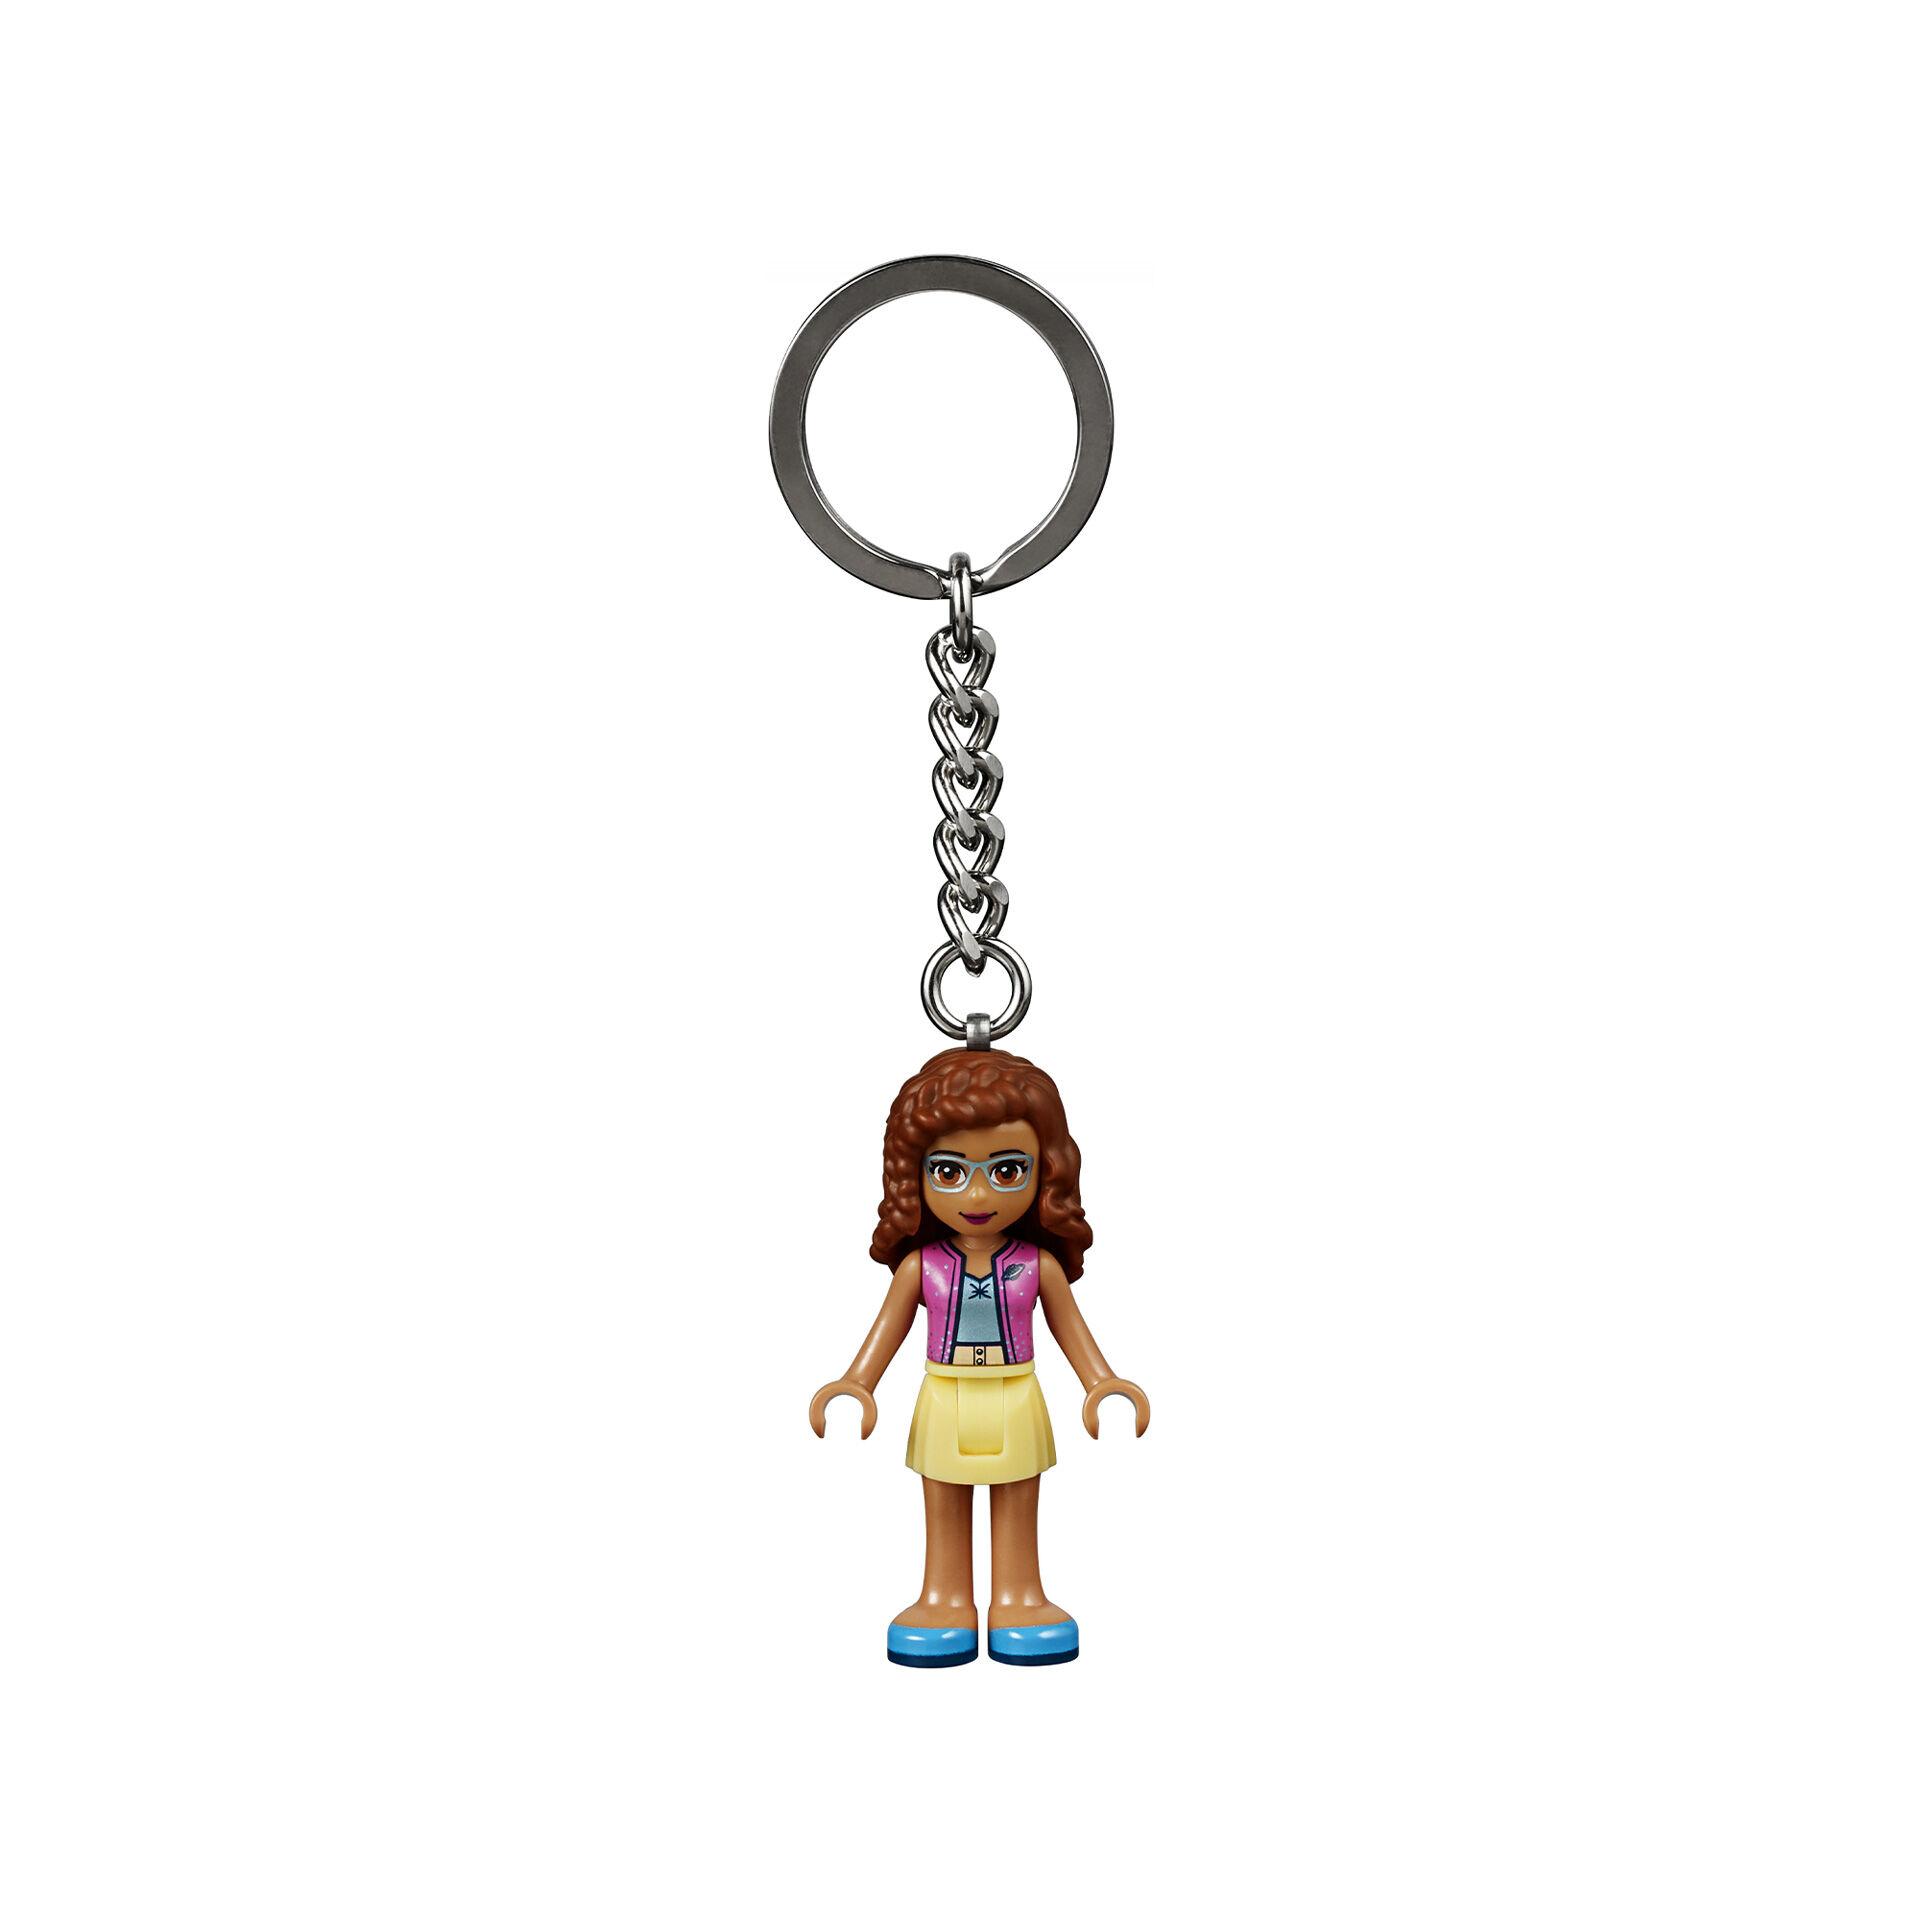 Porte-clés Olivia 853883, , large